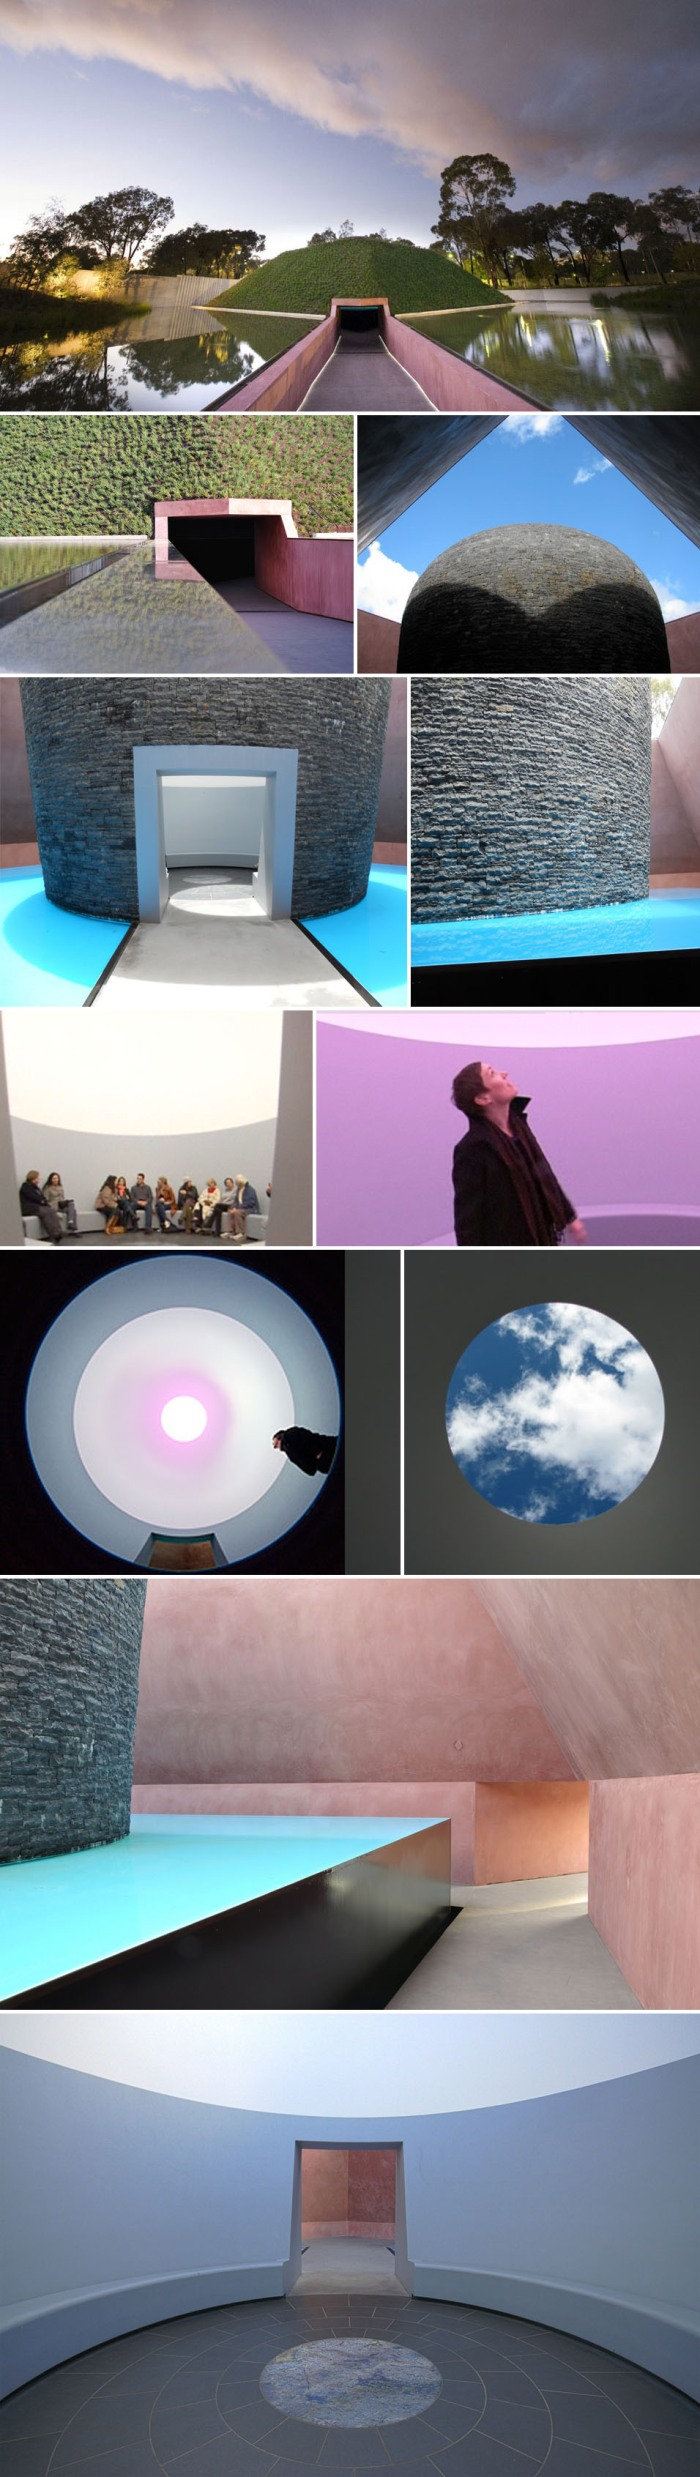 Turrell Skyspace, Light Installation, Art, National Gallery Australia